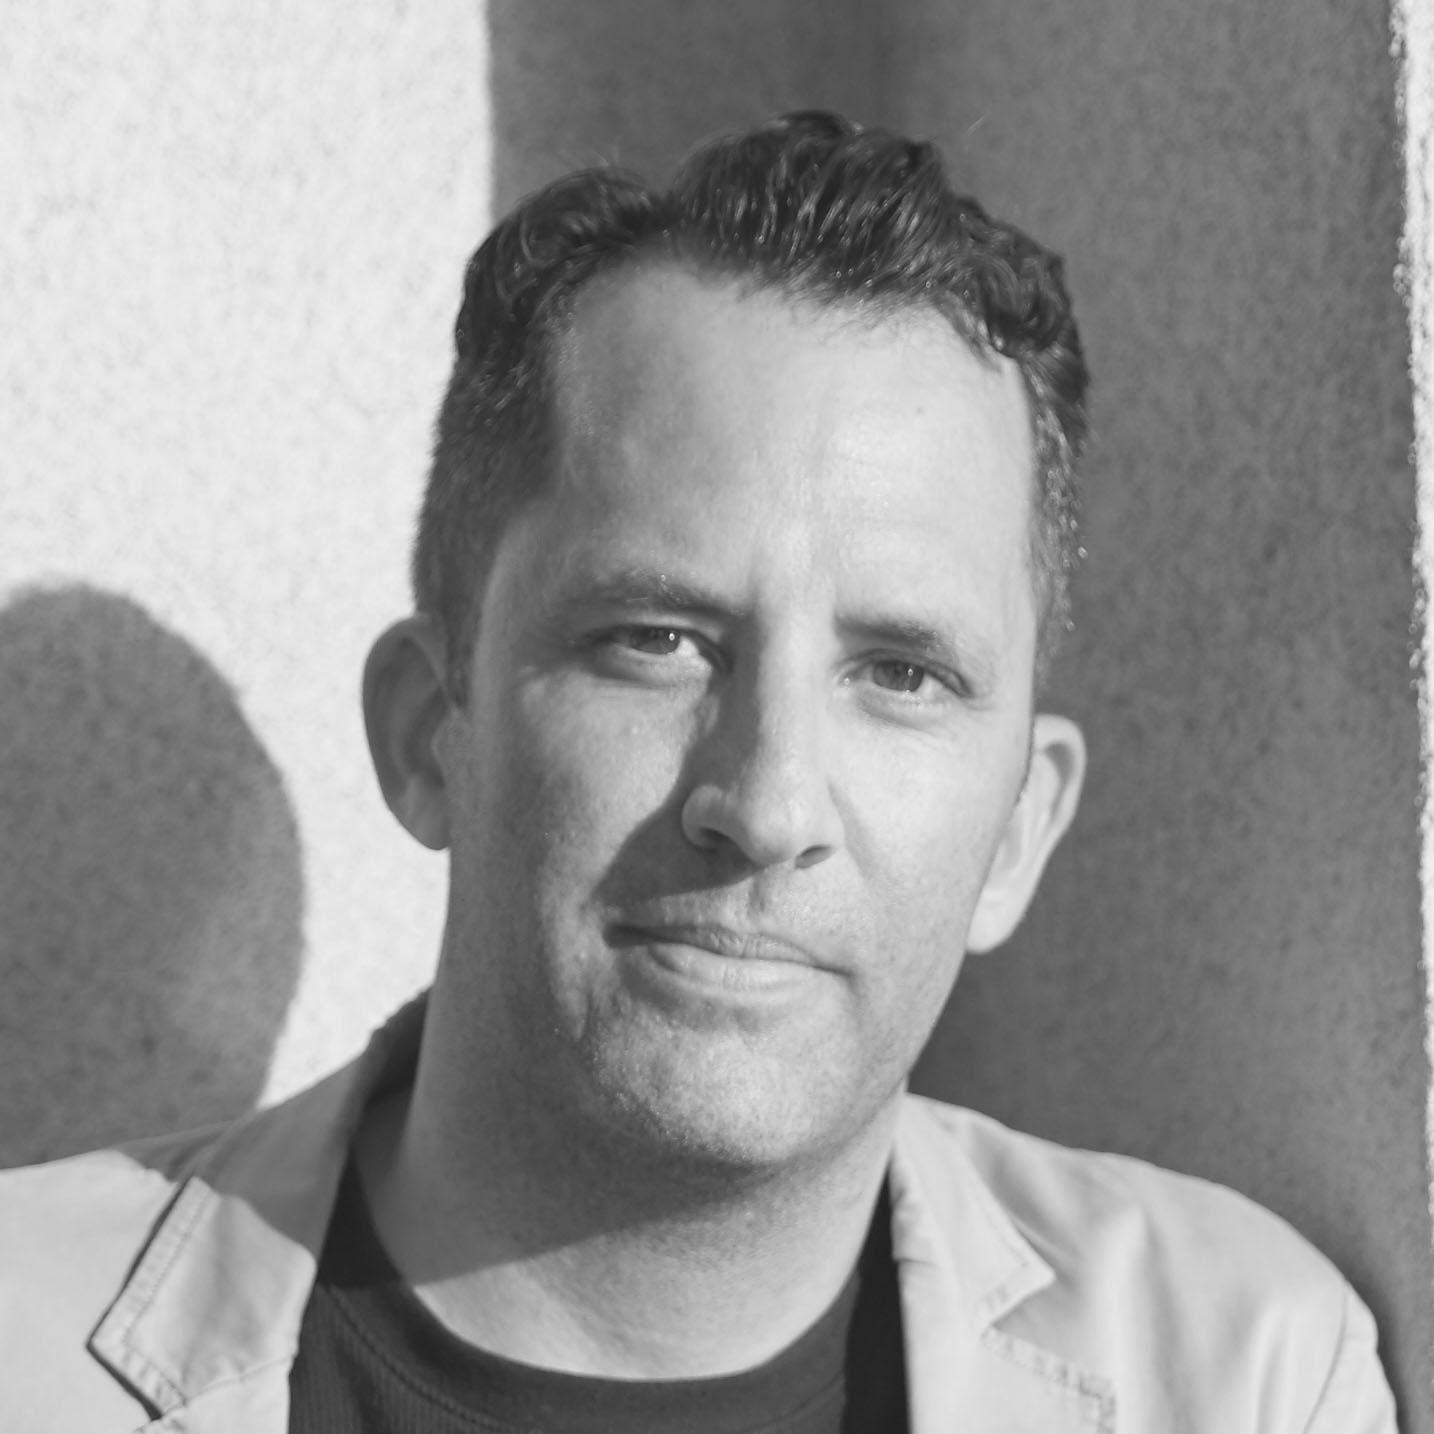 Jonathan Sinton portrait